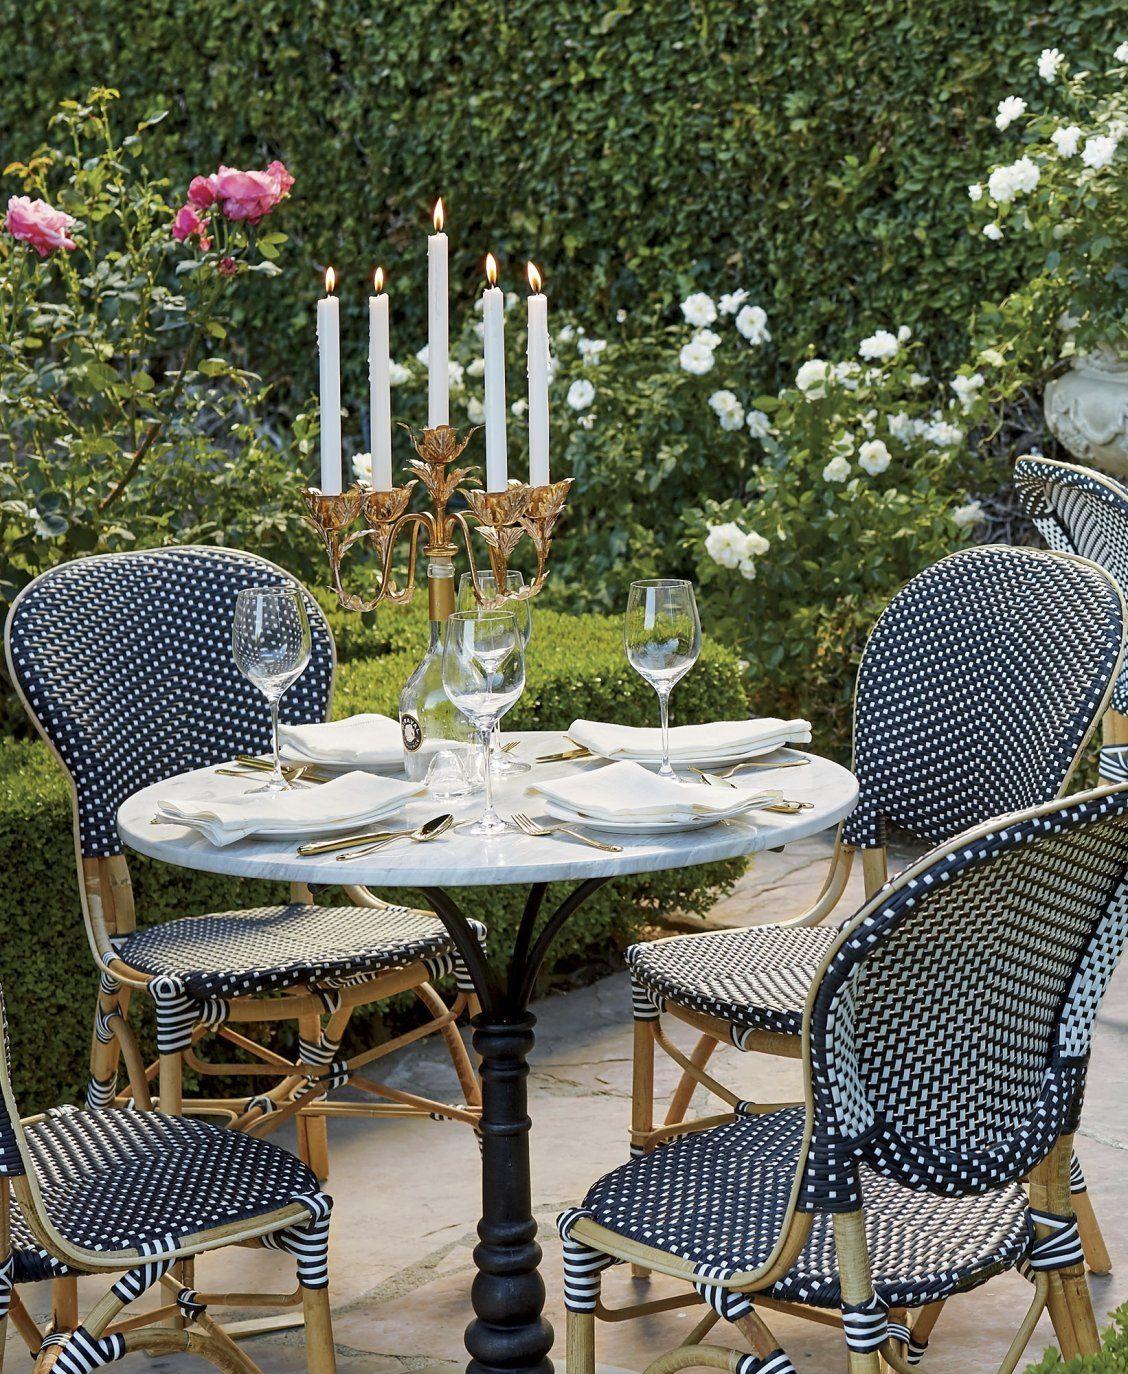 Tremendous Paris Bistro Collection House Used Outdoor Furniture Ibusinesslaw Wood Chair Design Ideas Ibusinesslaworg